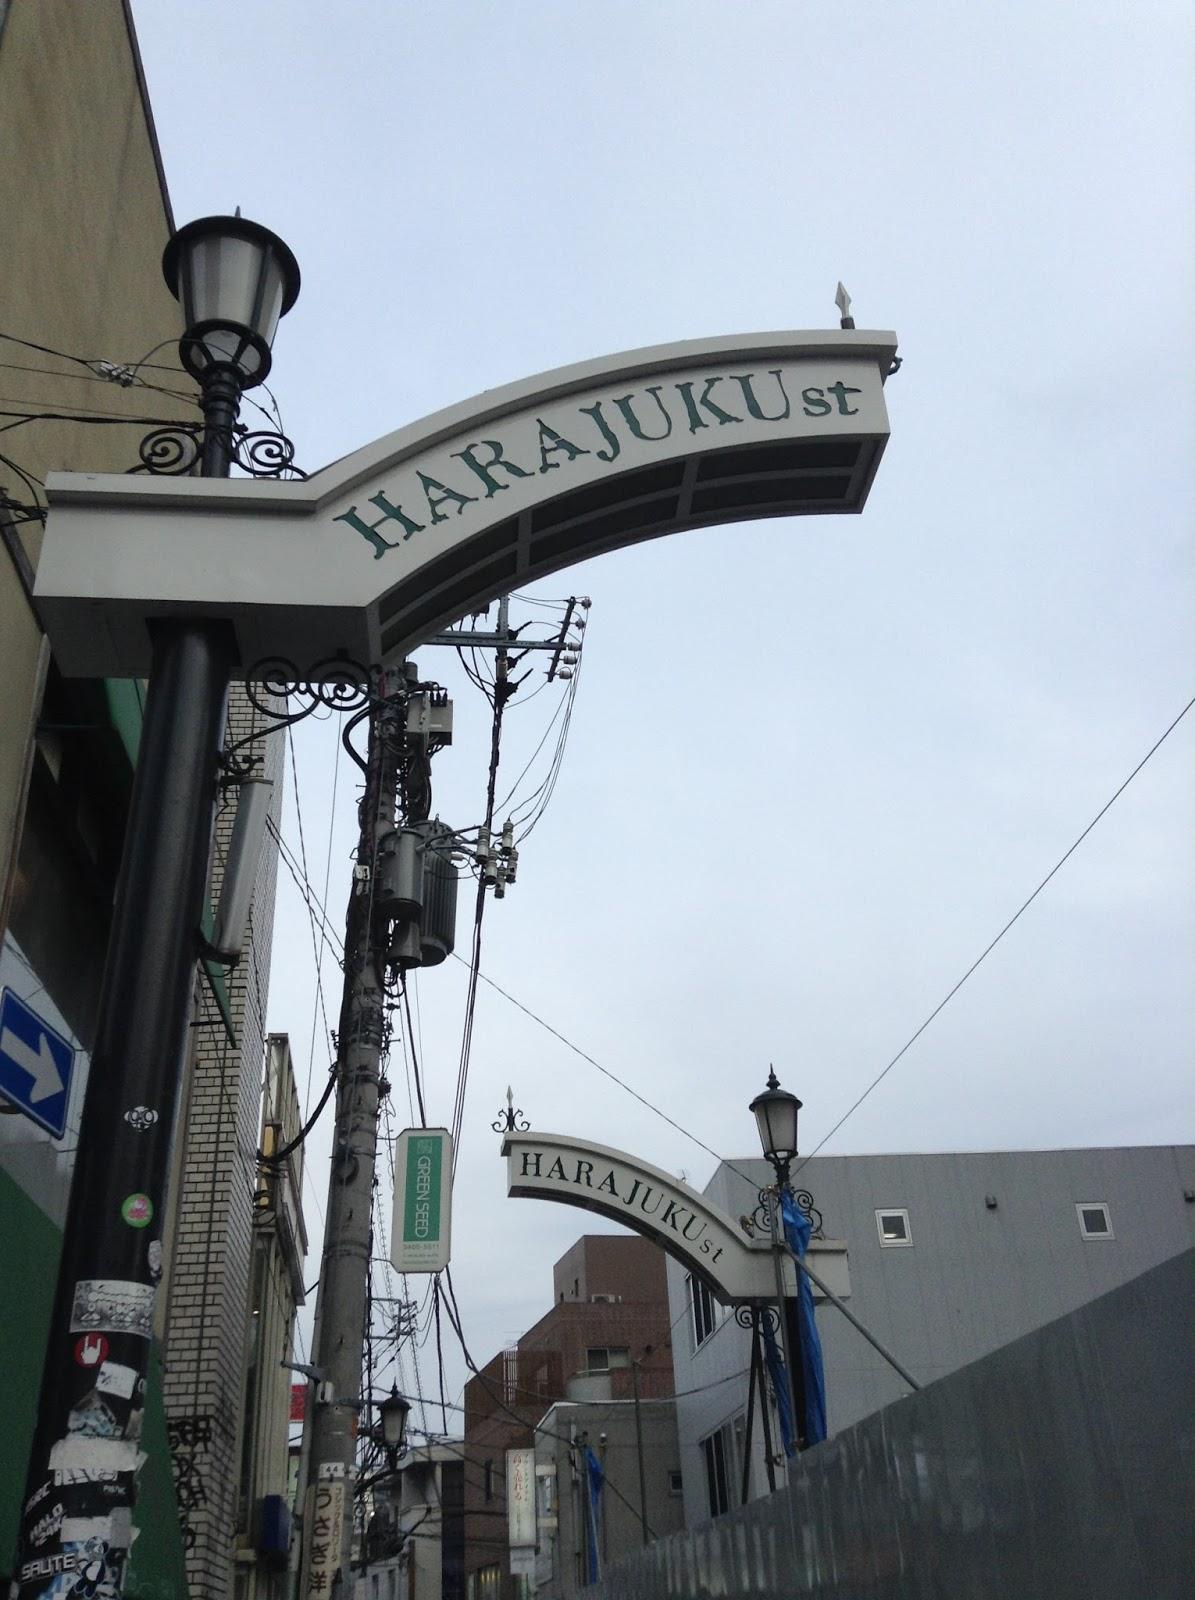 Harajuku street sign